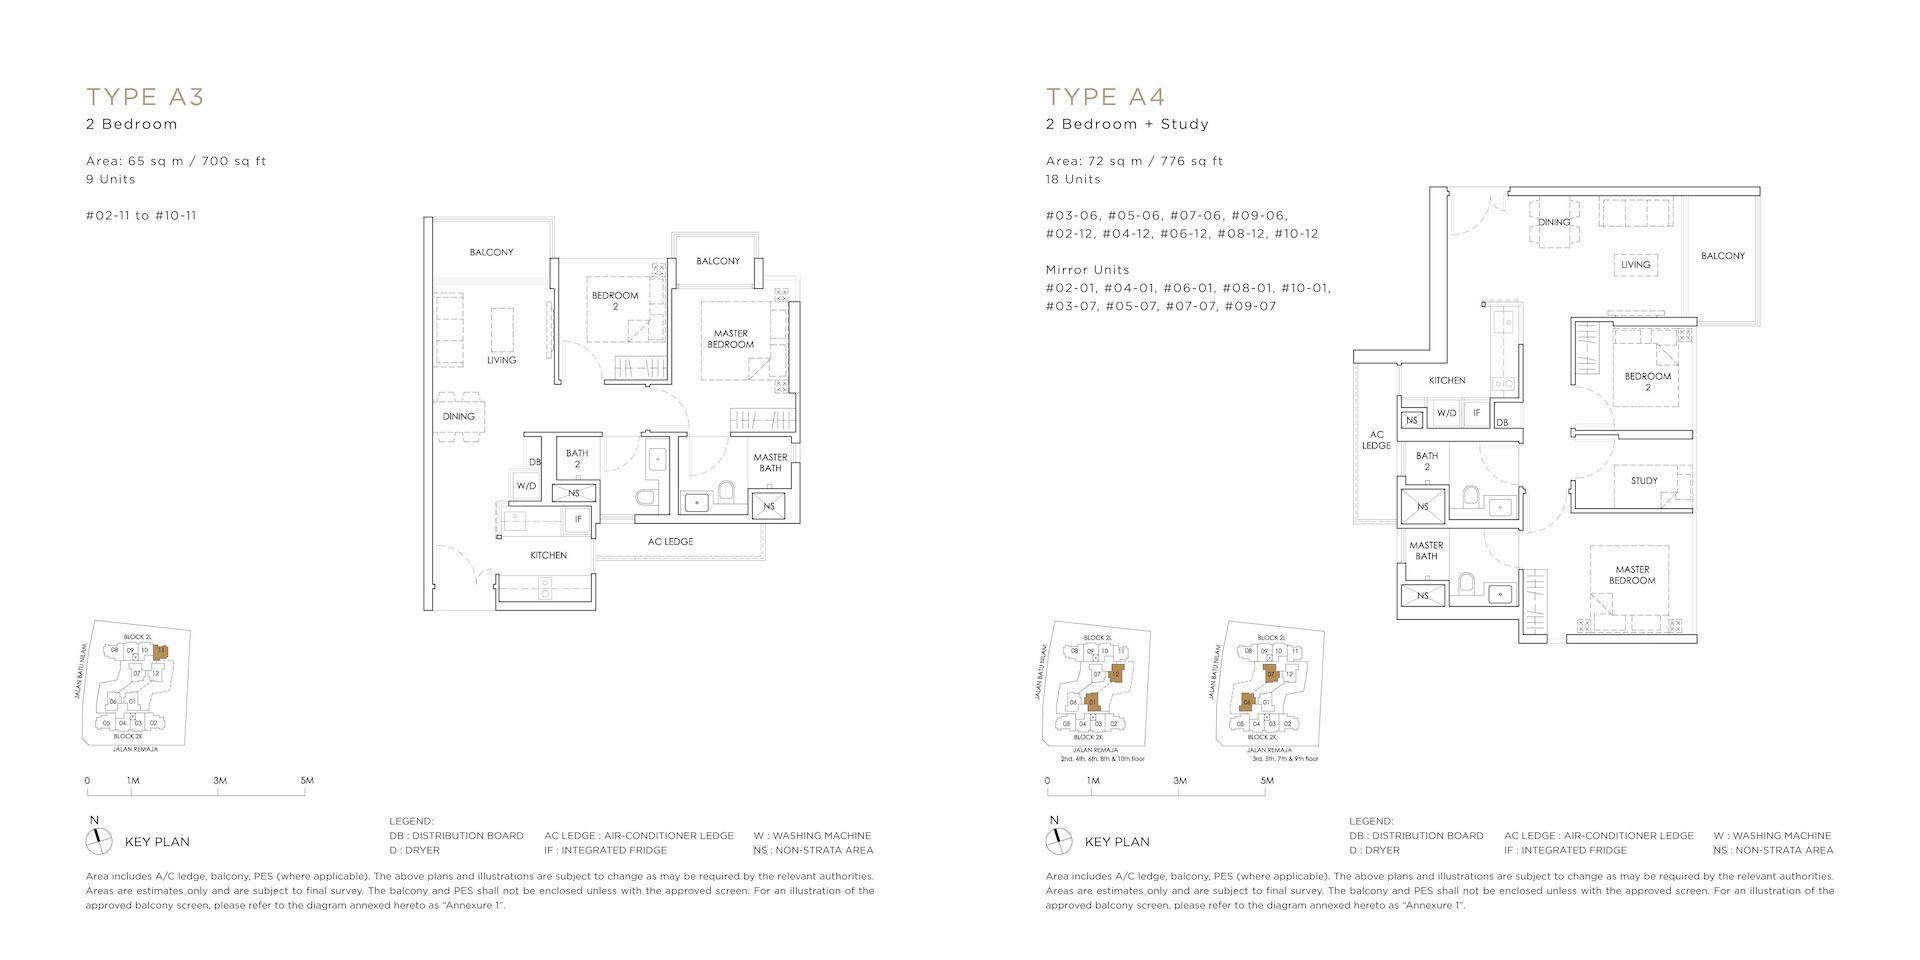 A3 A4 Floor Plan - MONT BOTANIK RESIDENCE